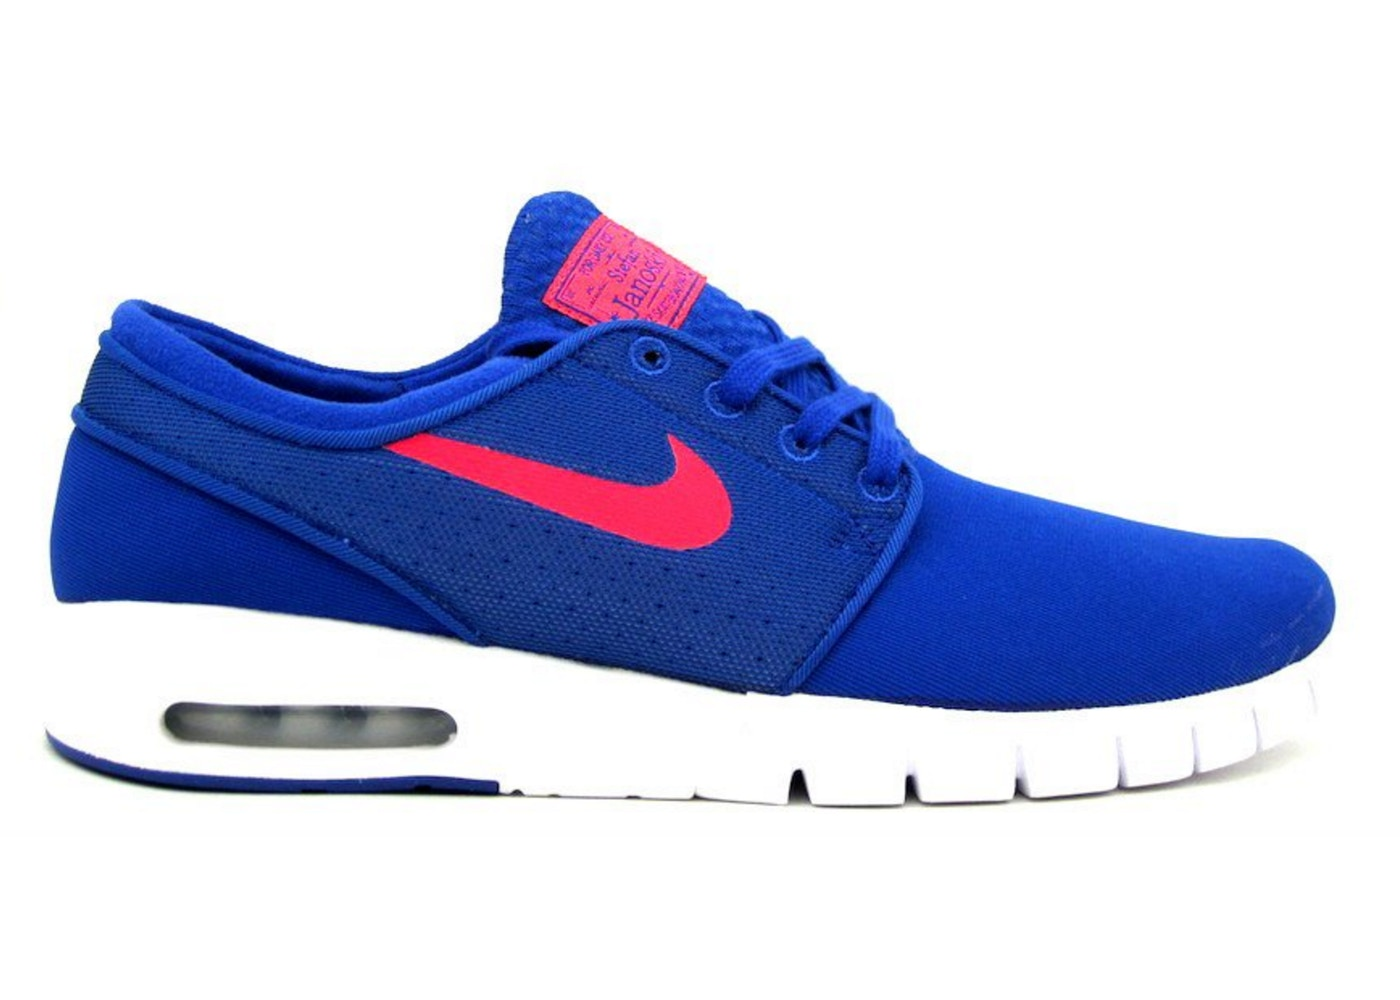 timeless design 38dca 9e99d Nike SB Janoski Shoes - Release Date